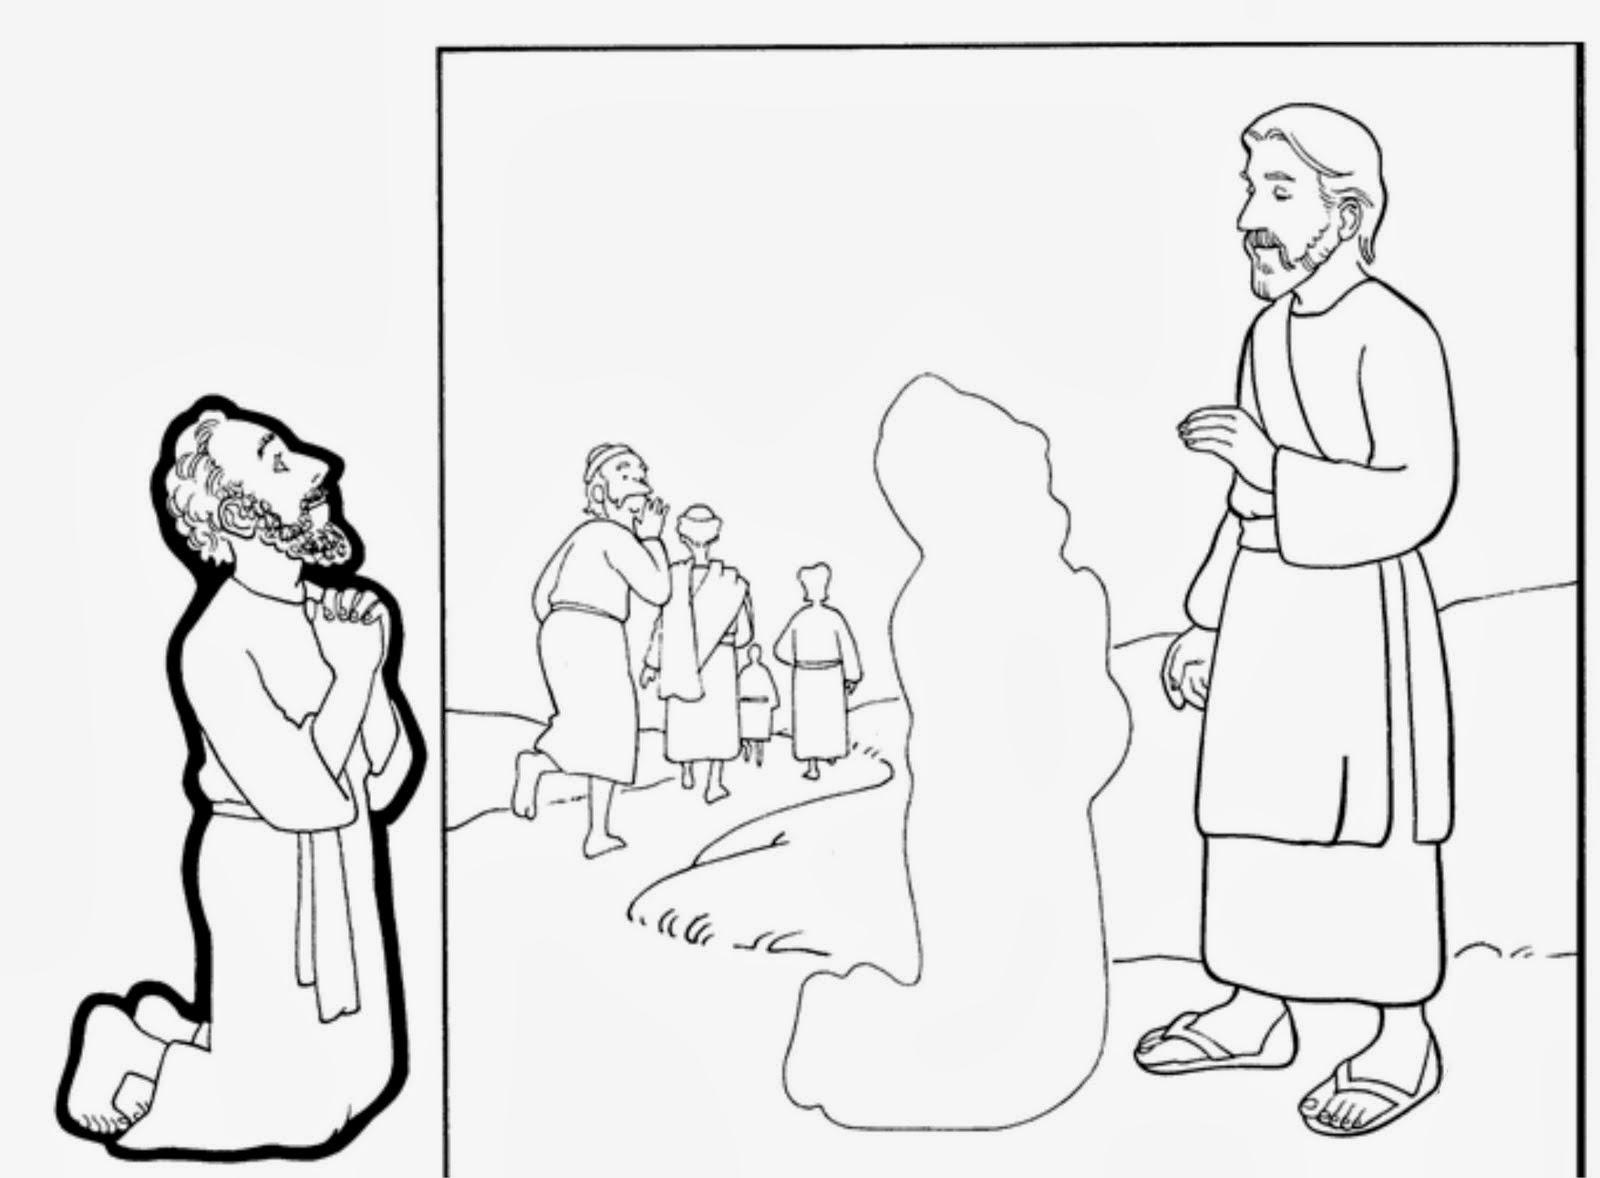 ME ABURRE LA RELIGIÓN: DIEZ LEPROSOS SON SANADOS